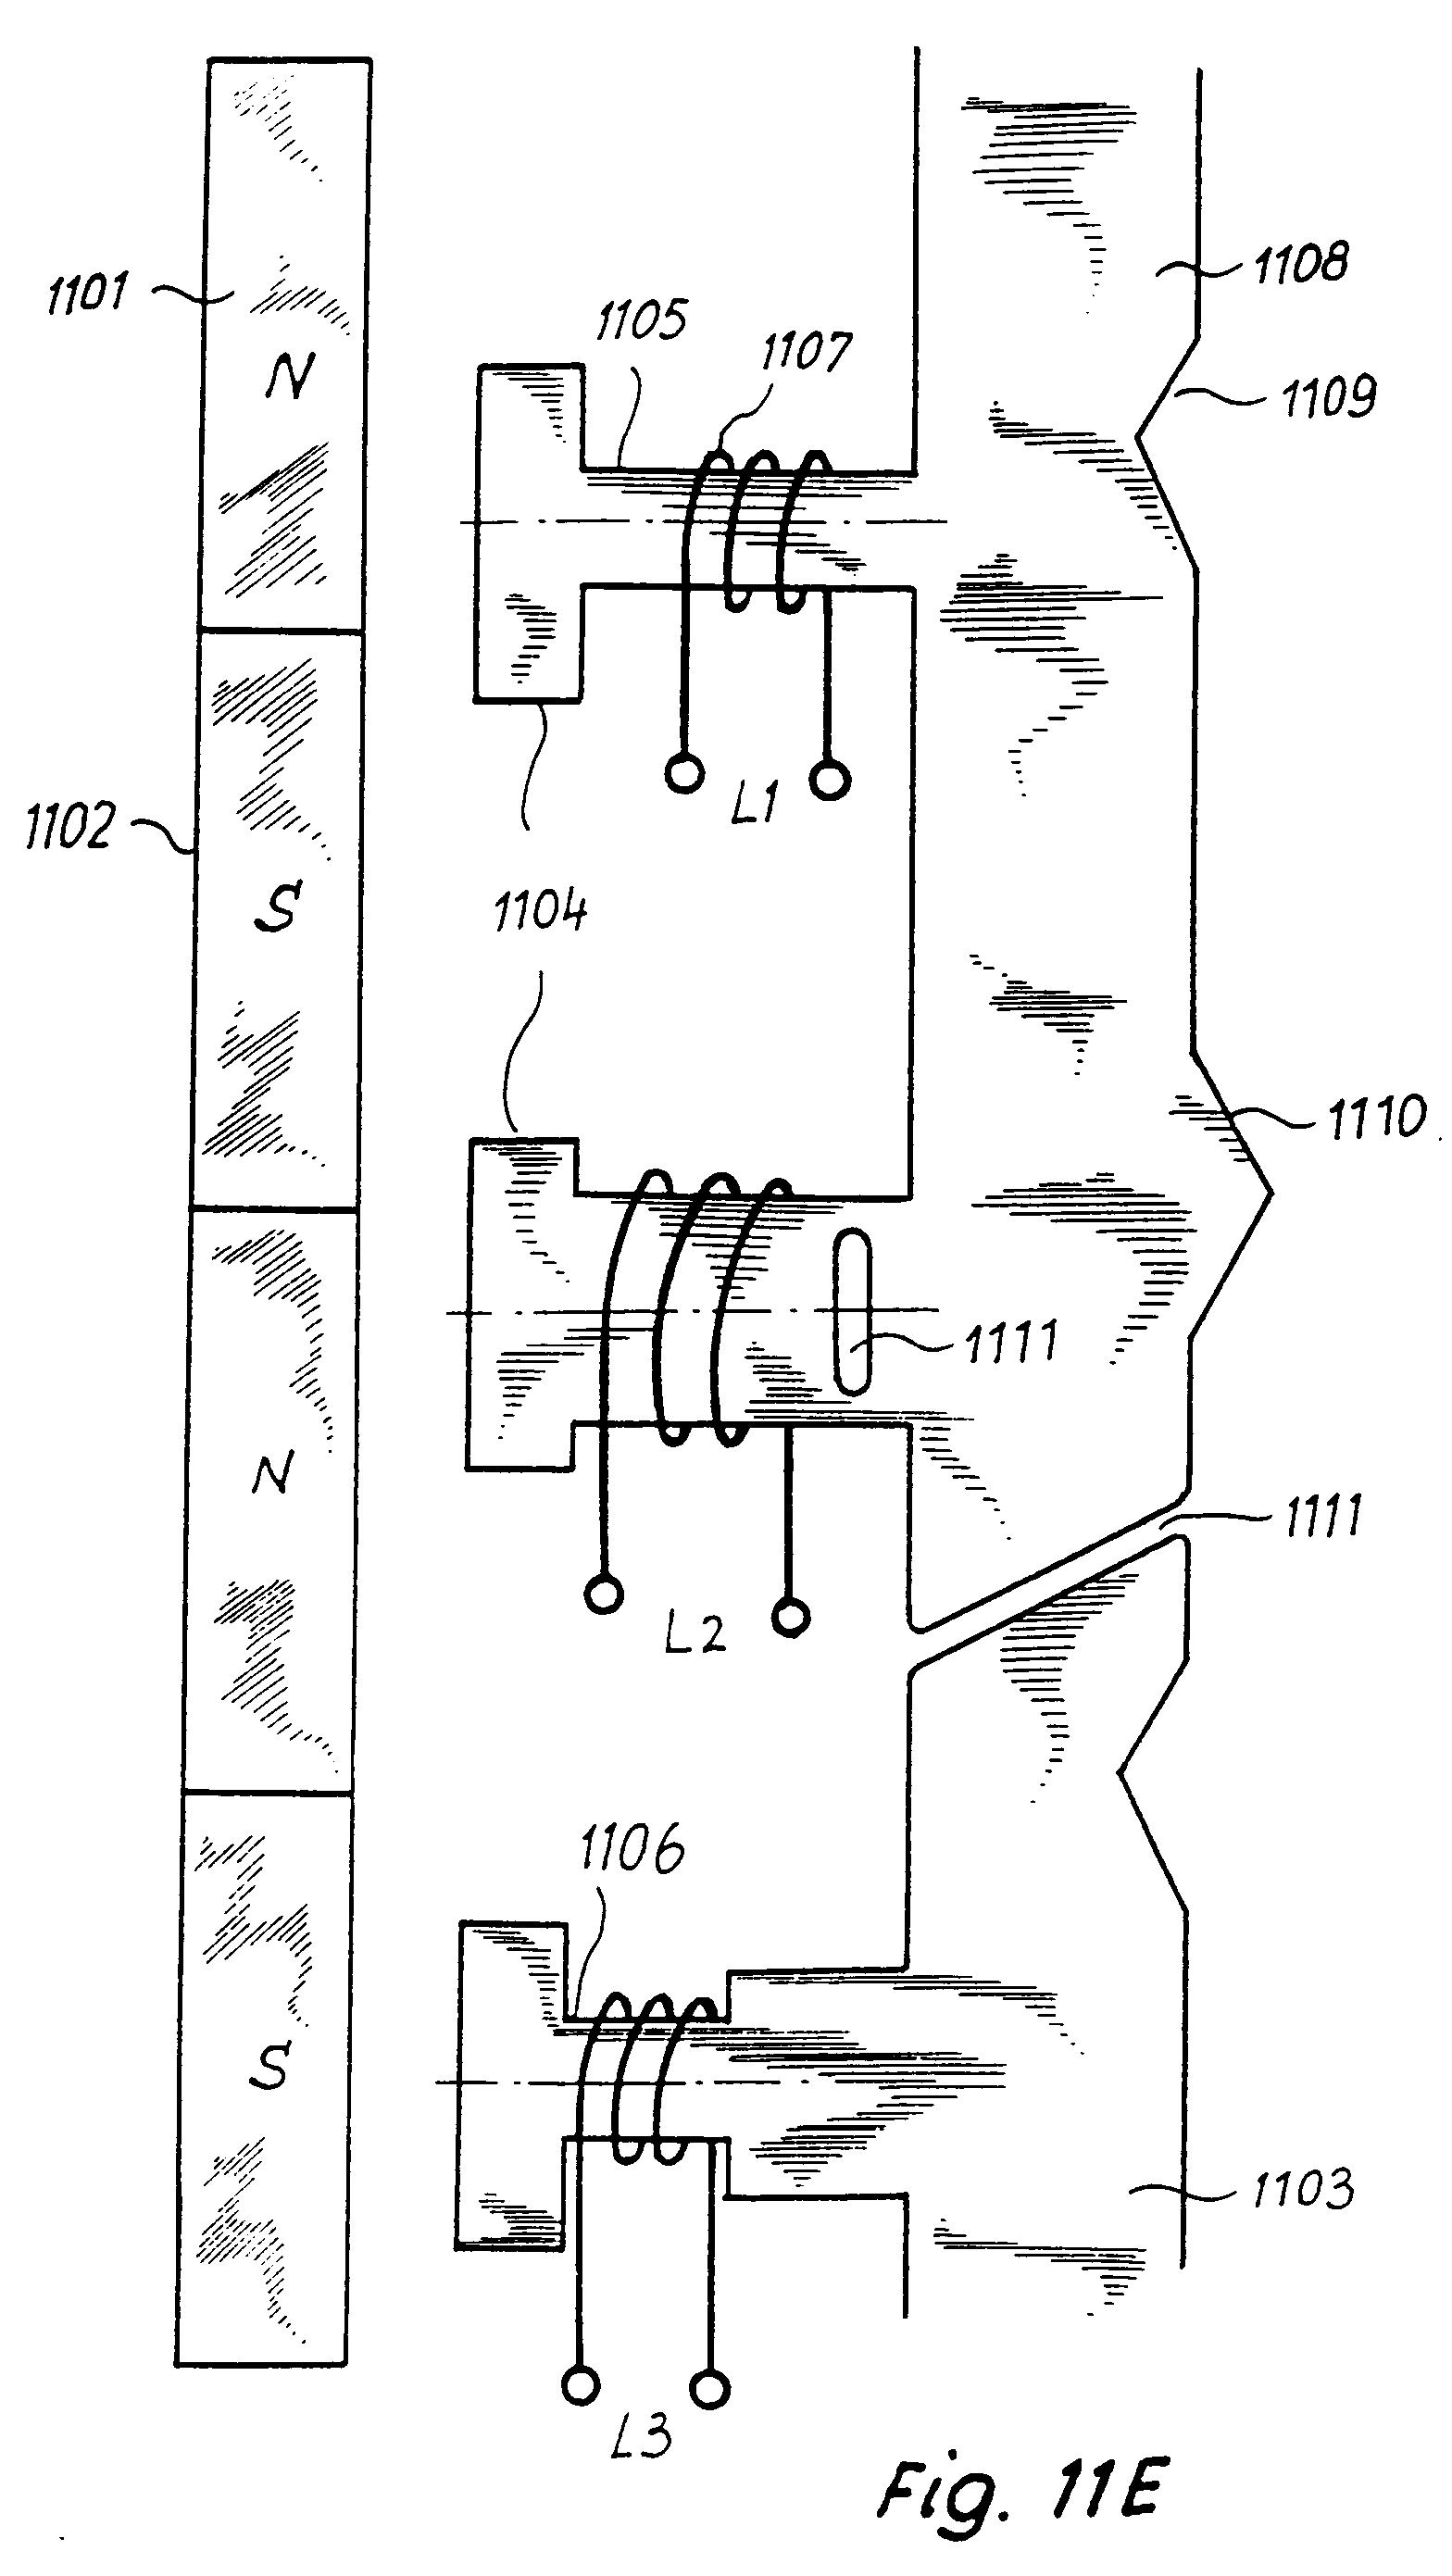 Rg550 Wiring Diagram